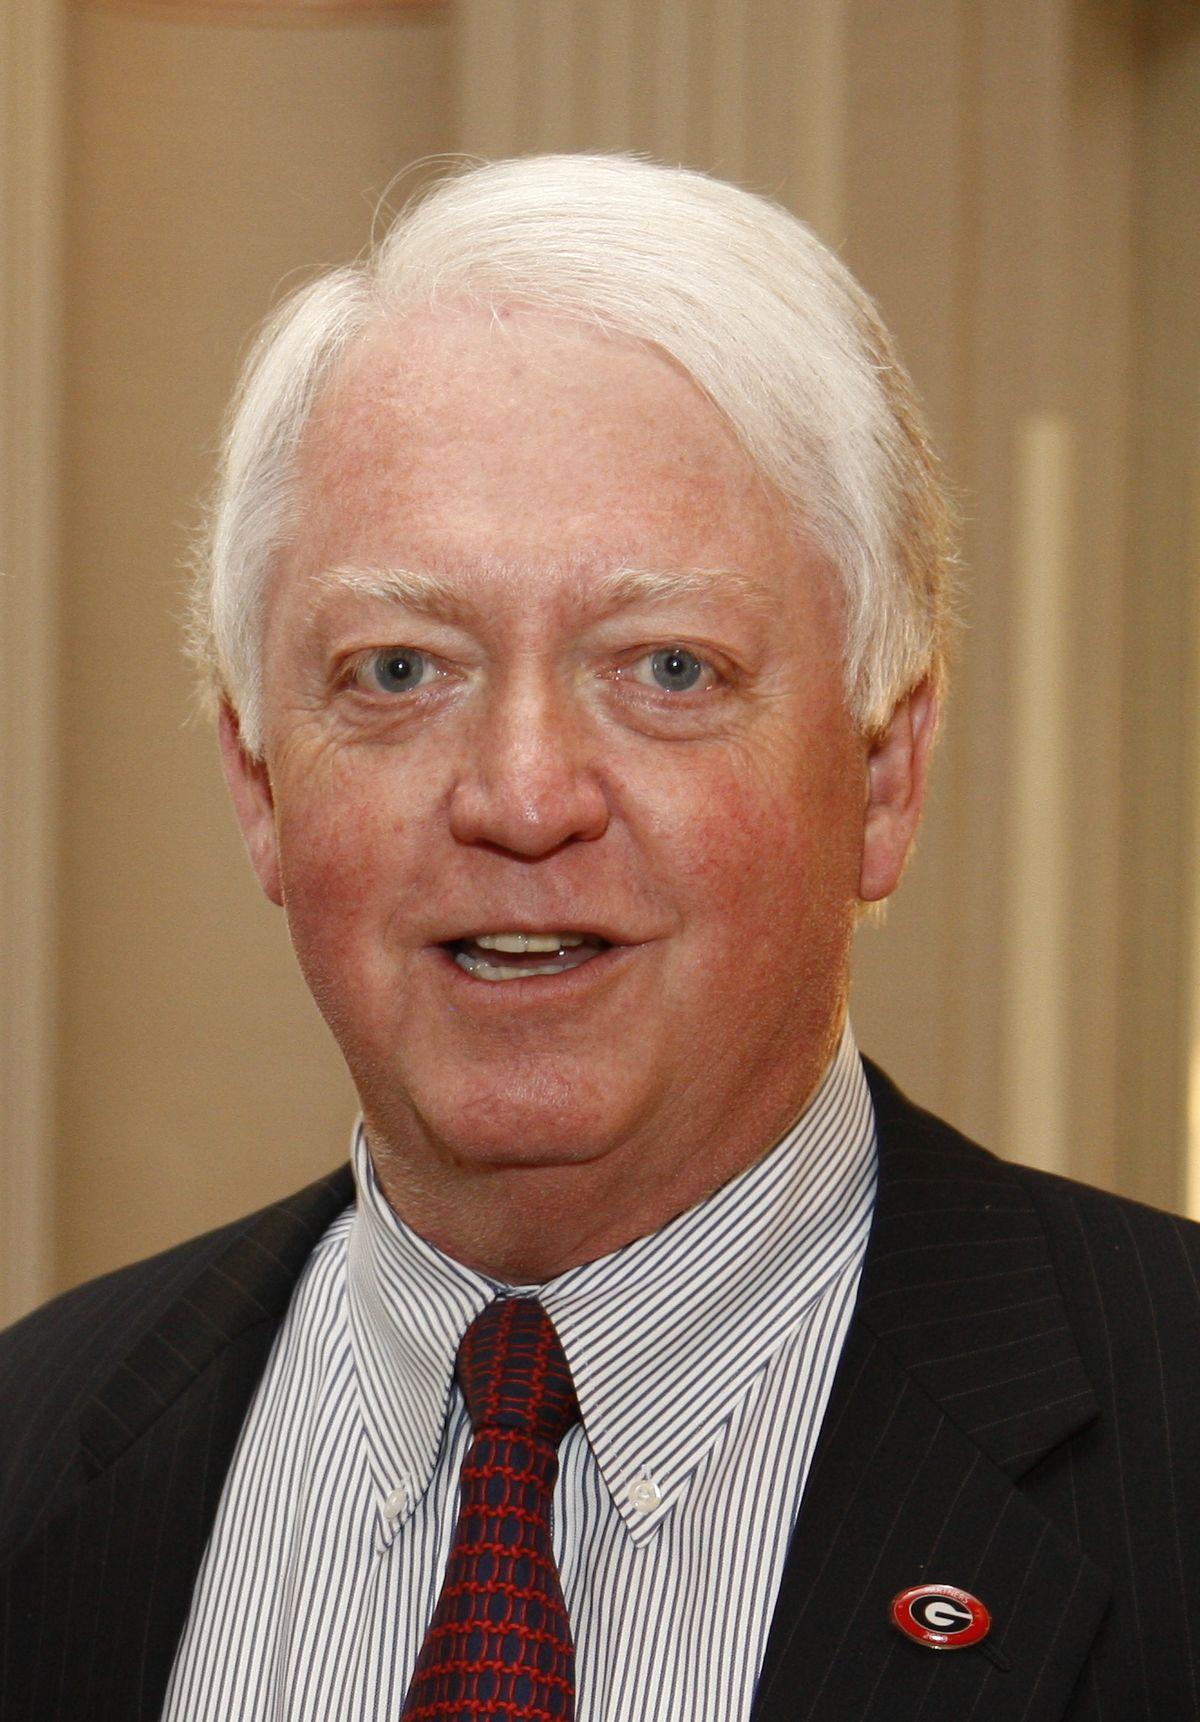 Michael F Adams